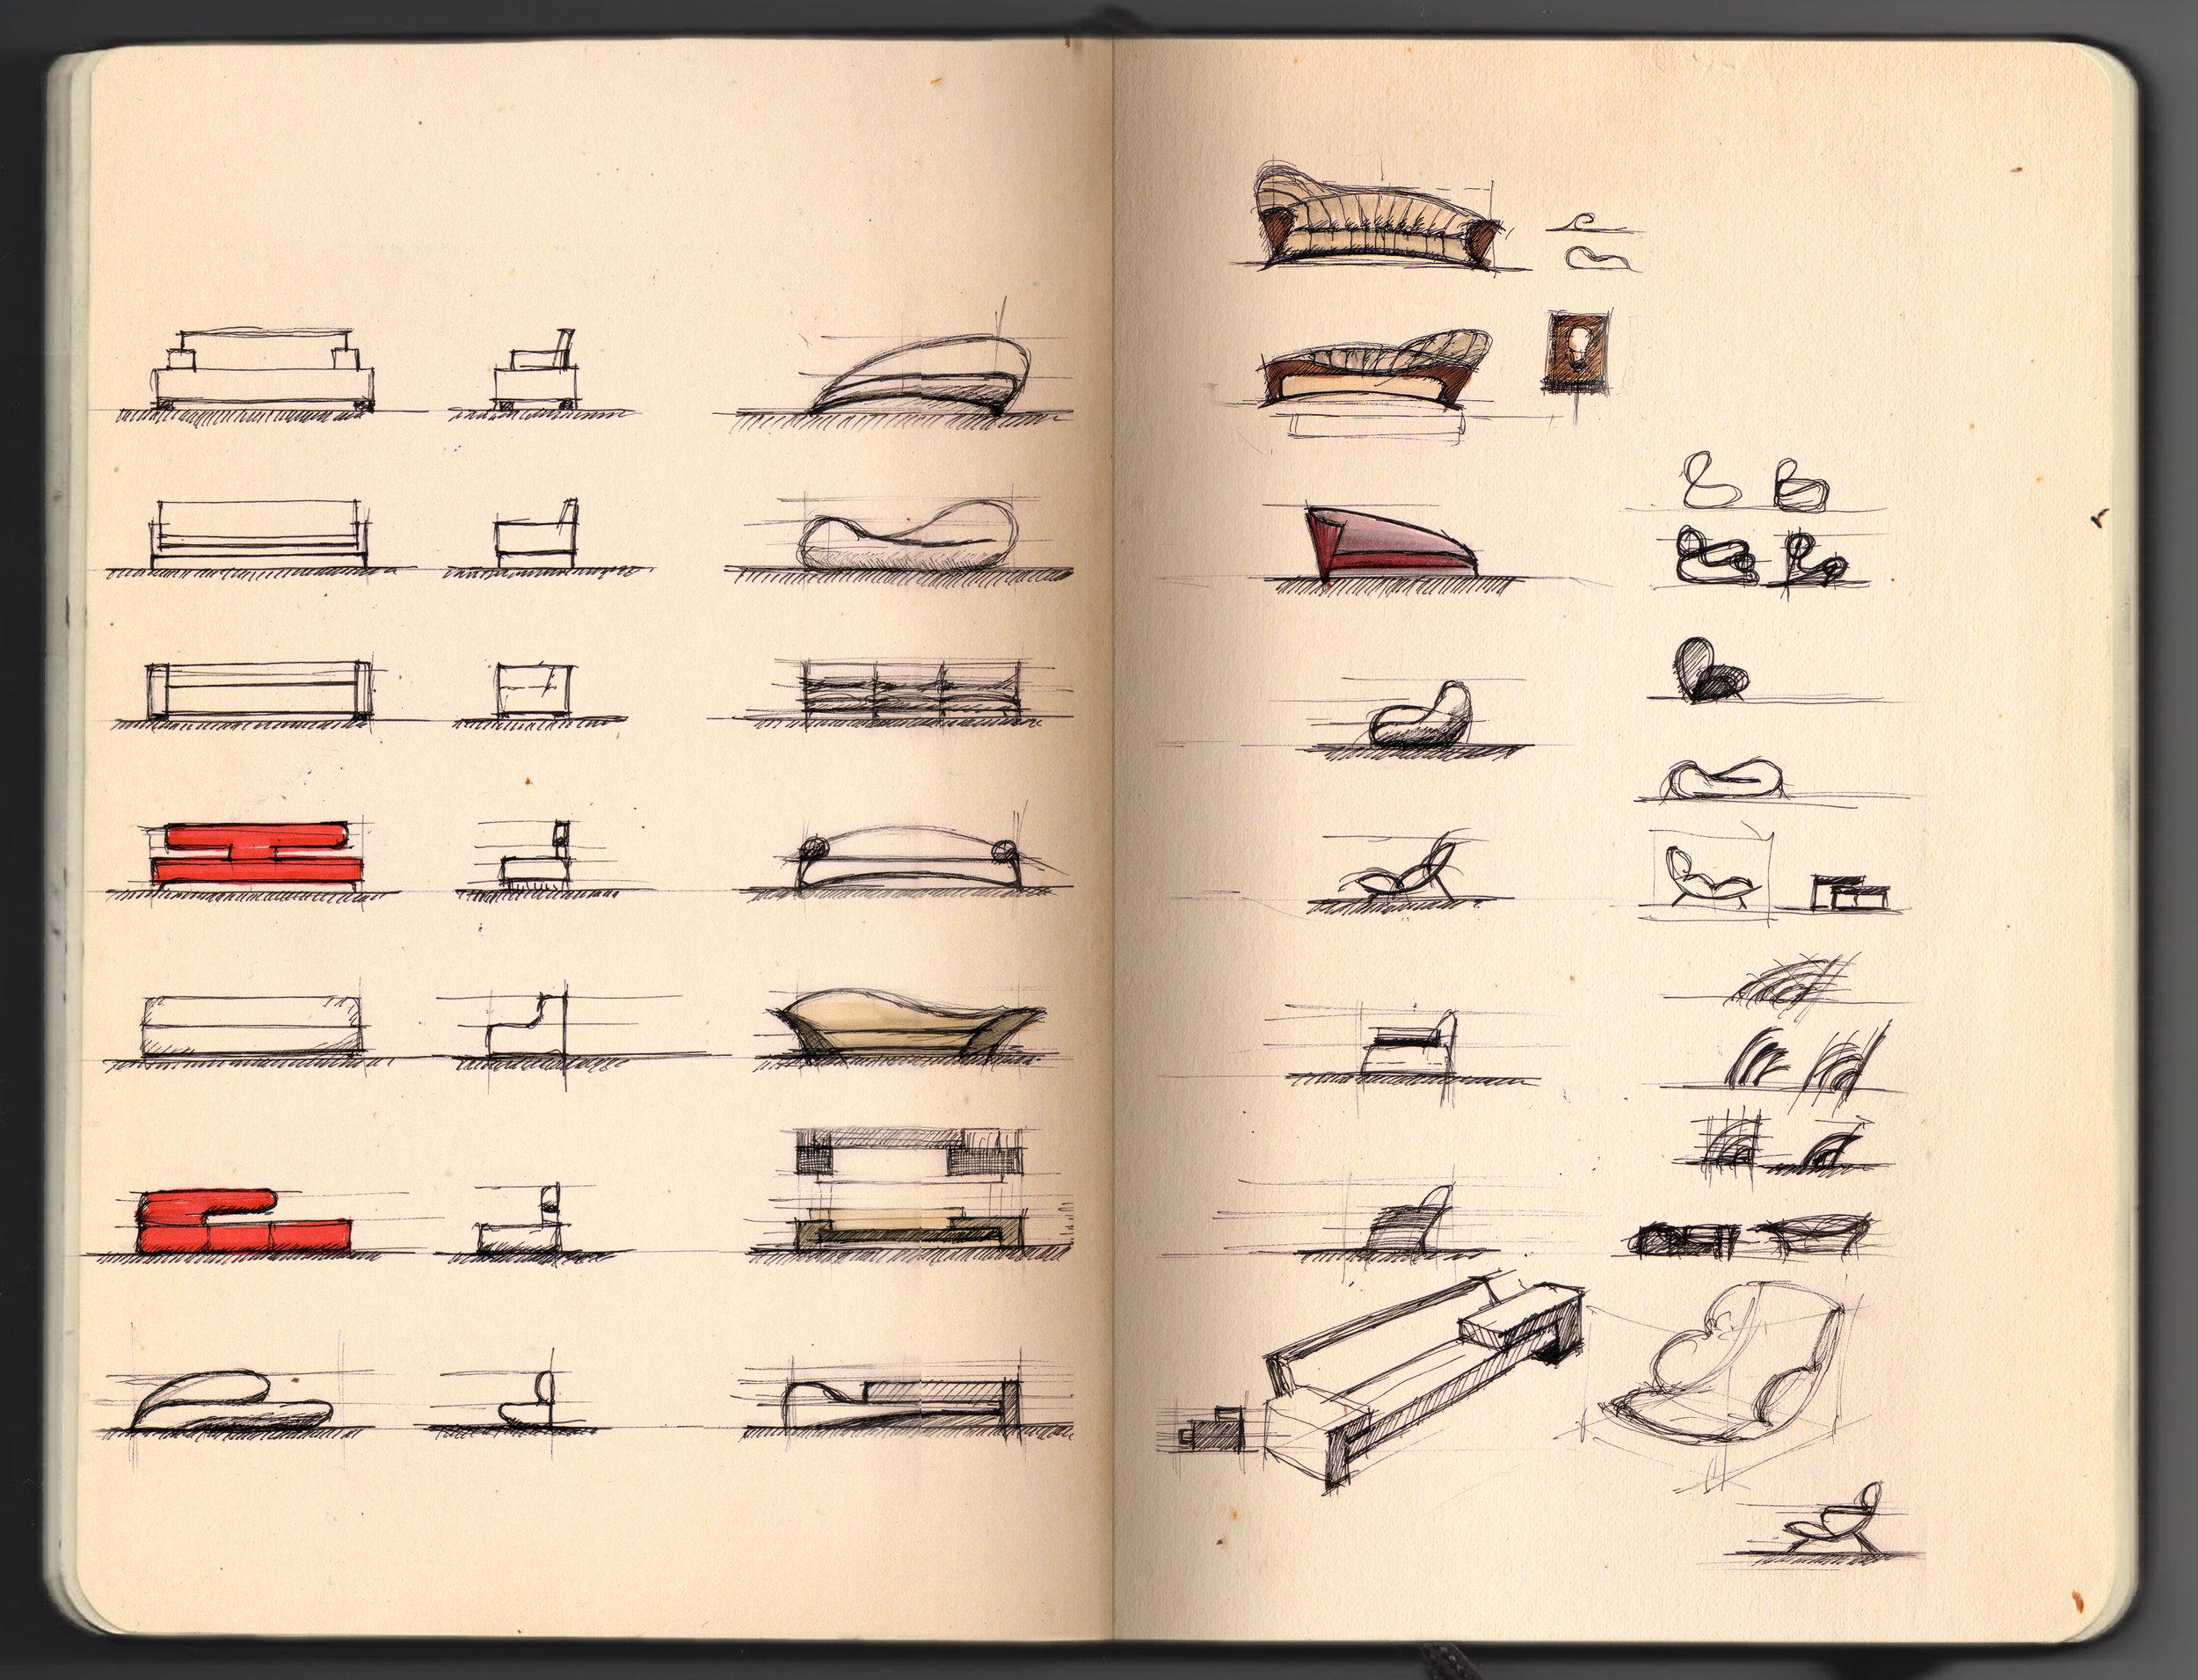 moleskine-book011.jpg